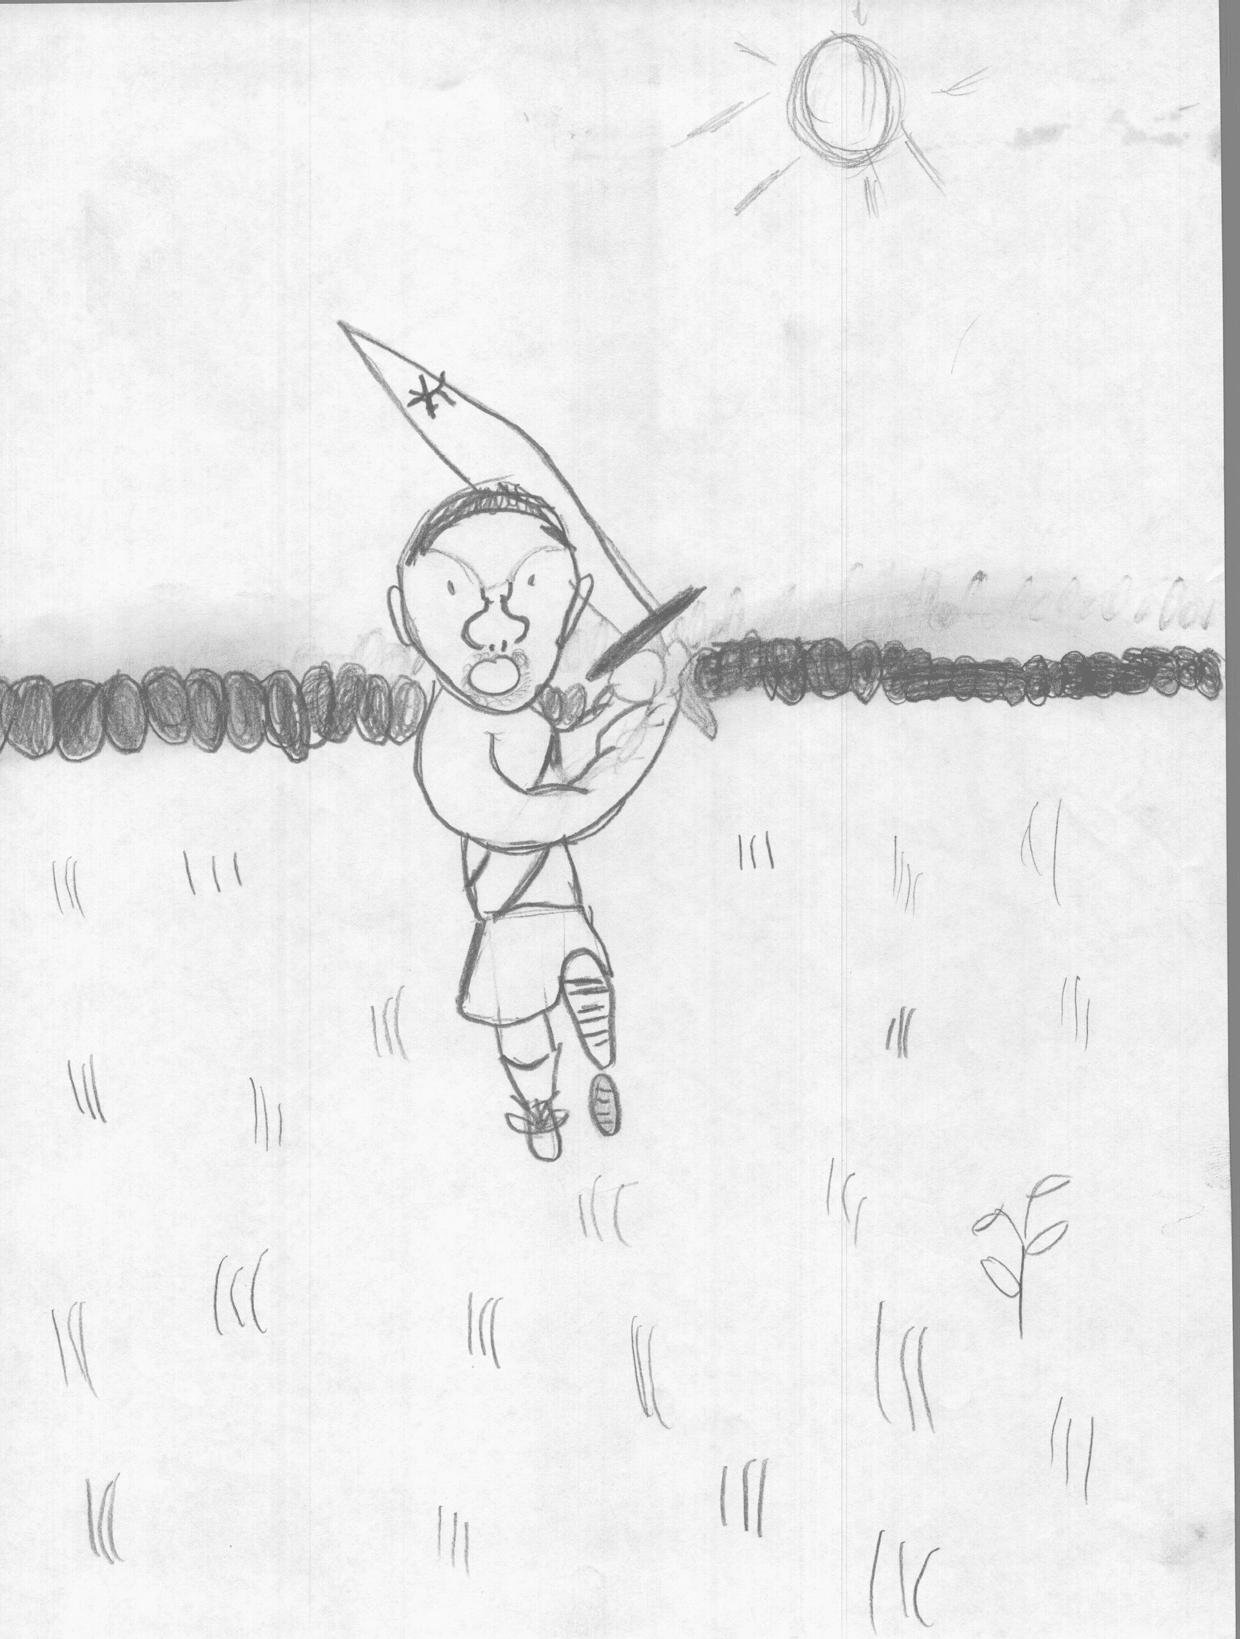 1240x1639 February 2013 Gavin Draws The World